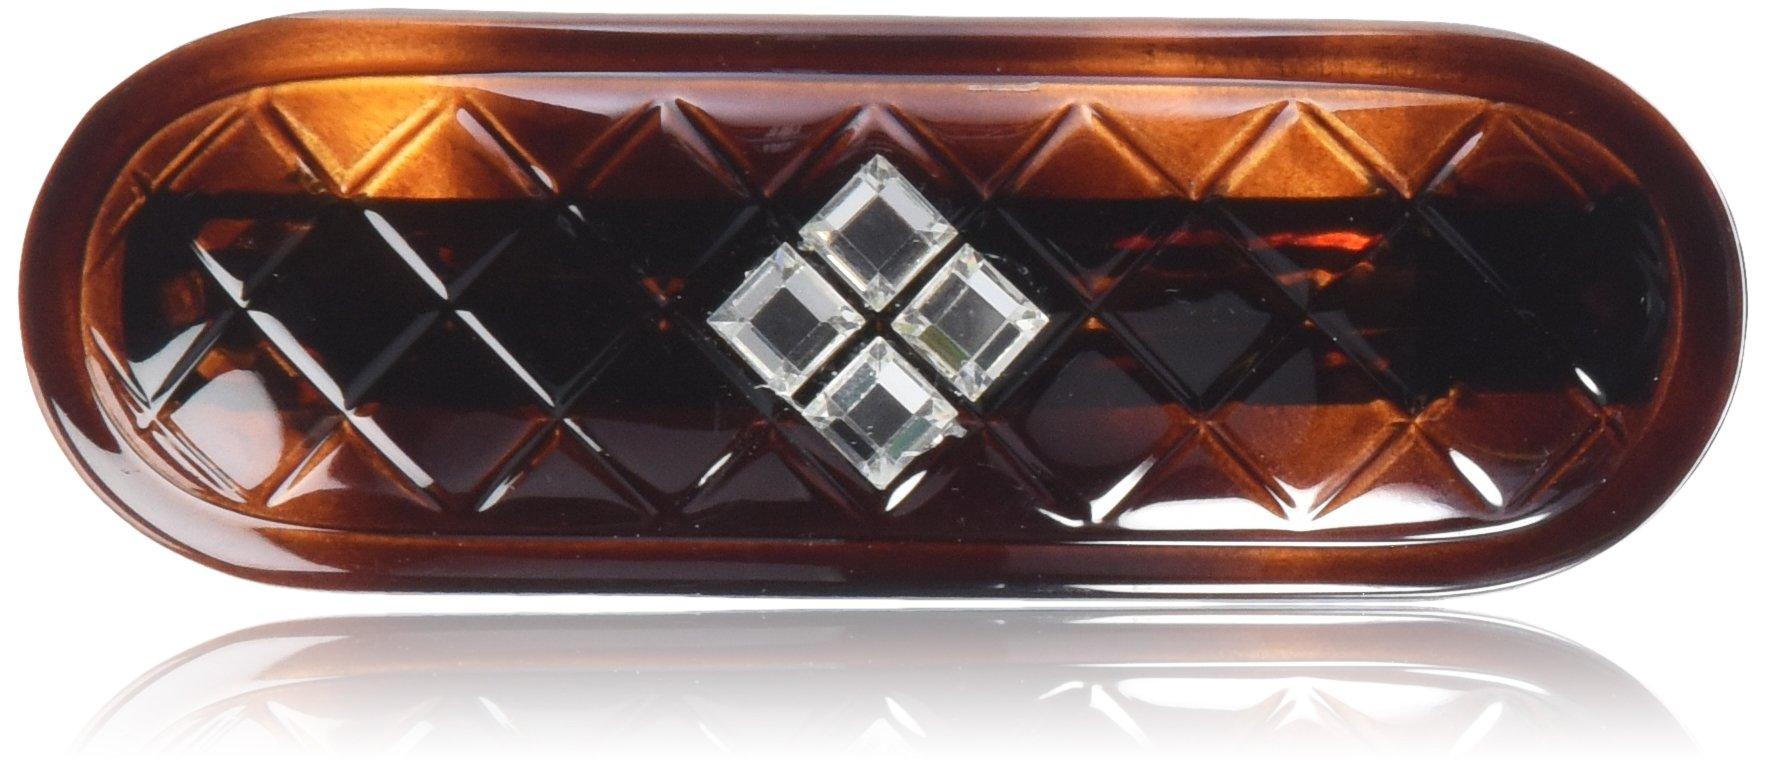 Caravan Diamond Design Automatic Barrette Decorated with Crystal Swarovski Rhine Stone, 0.5 Ounce